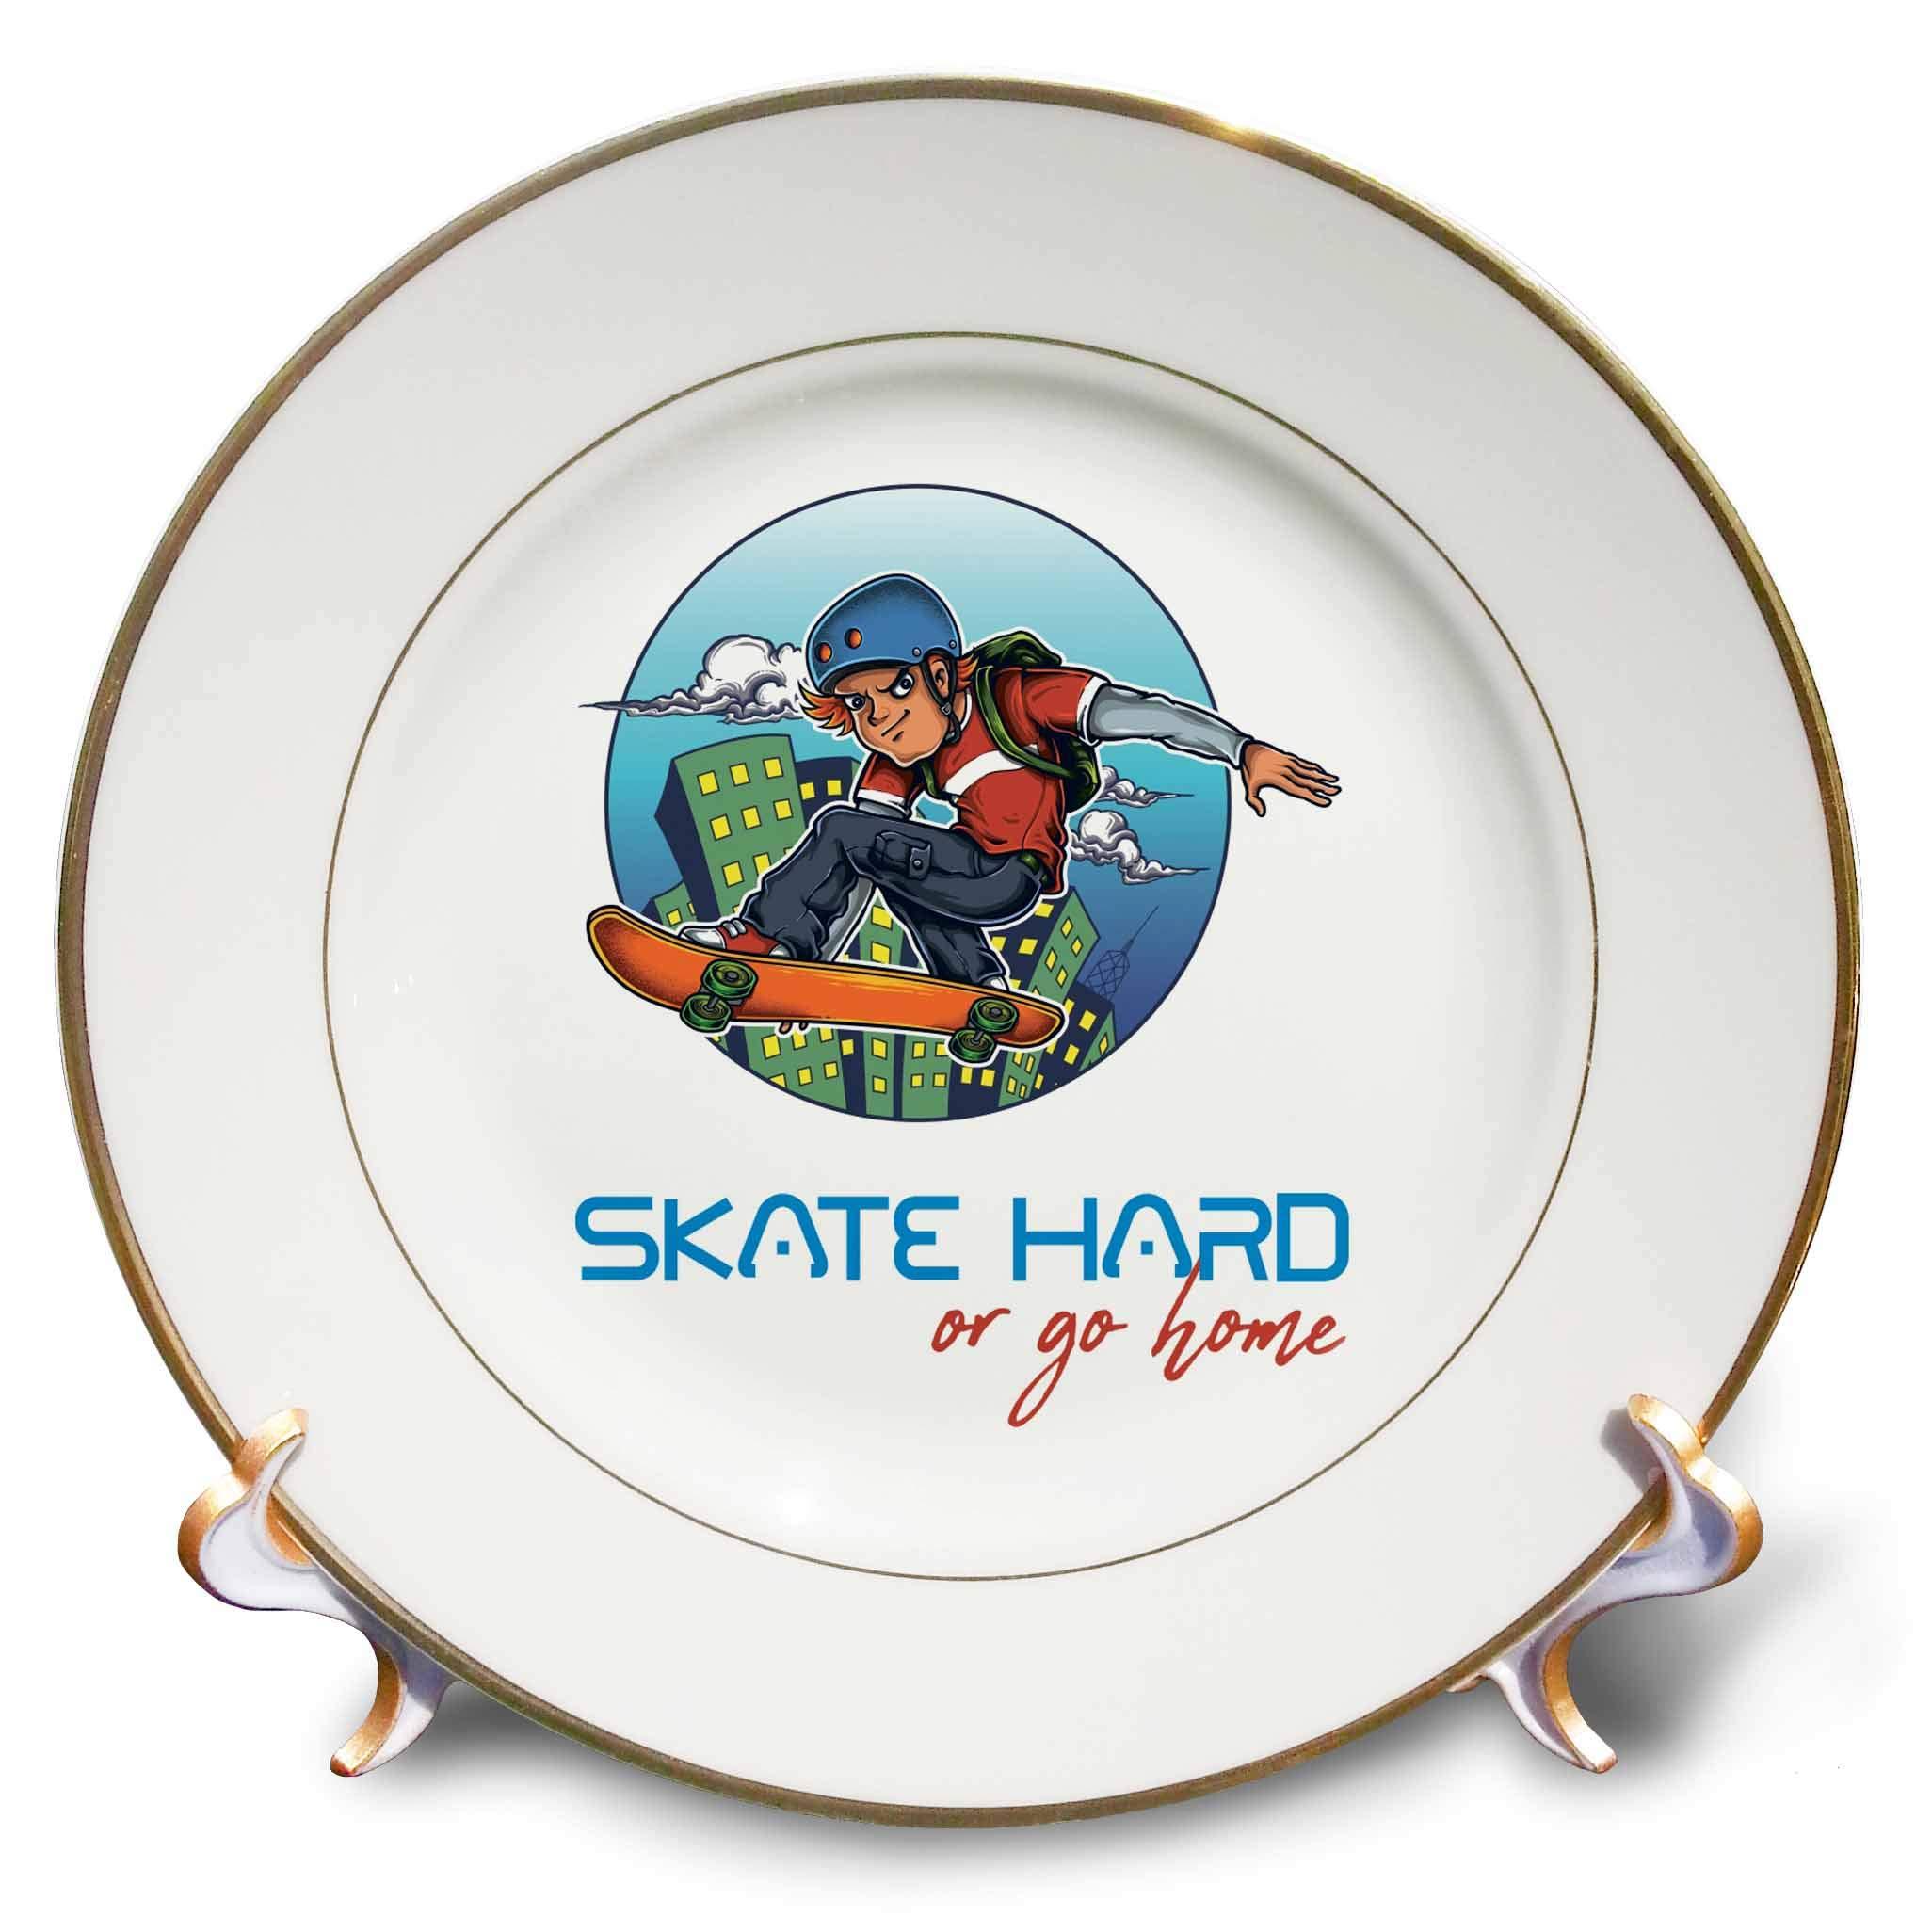 3dRose Alexis Design - Sport Skateboard - Brave Male Skater, a Skateboard. City Windows. Skate Hard or go Home - 8 inch Porcelain Plate (cp_292931_1)